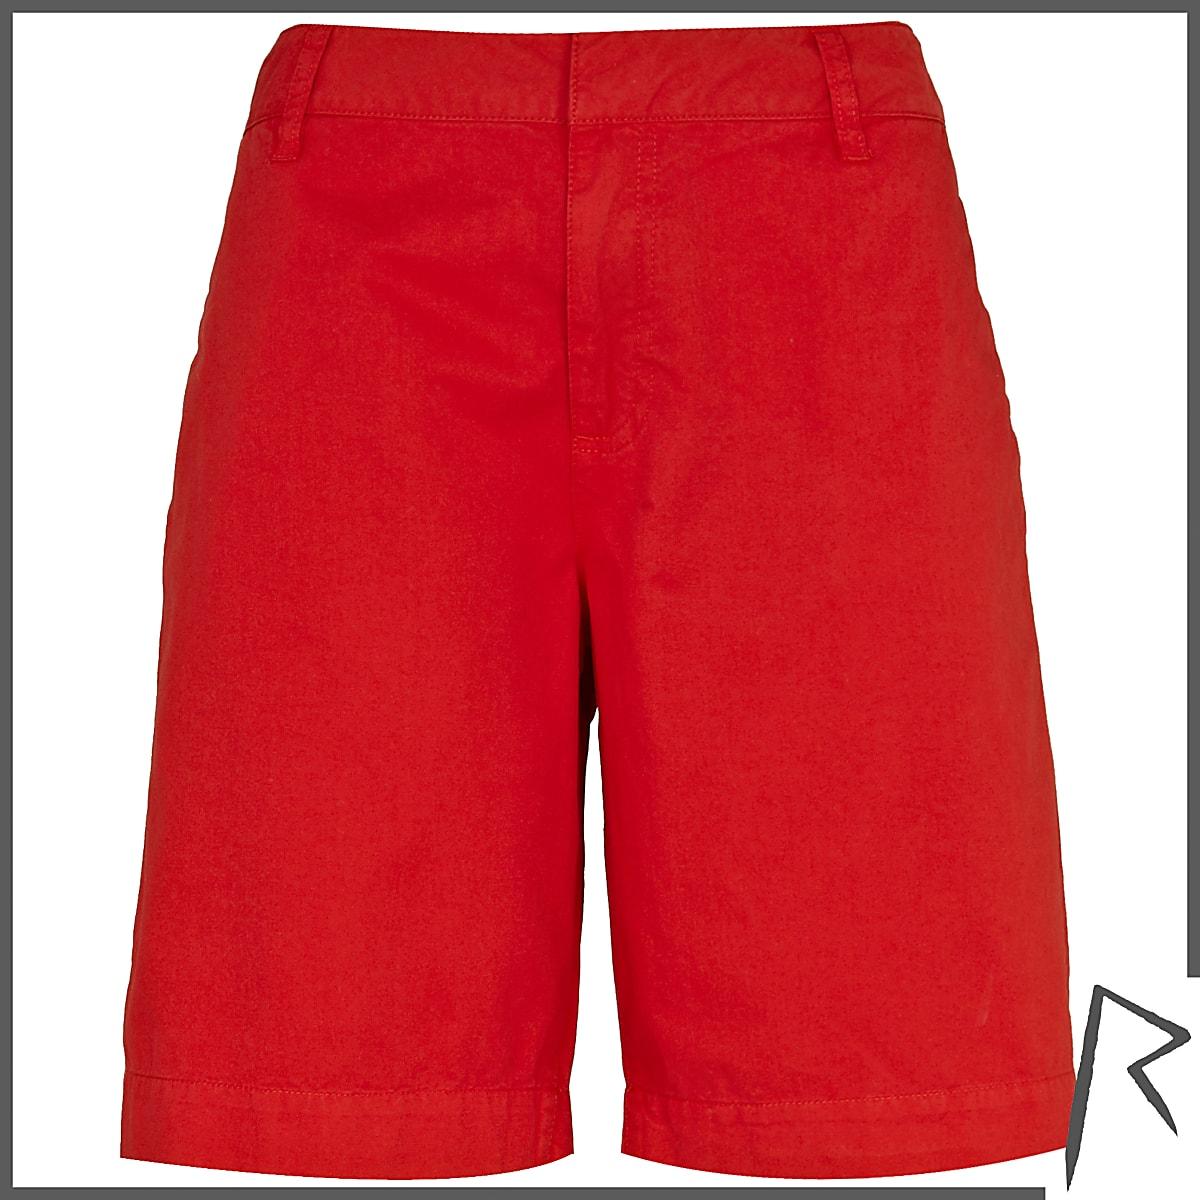 Red Rihanna boy shorts